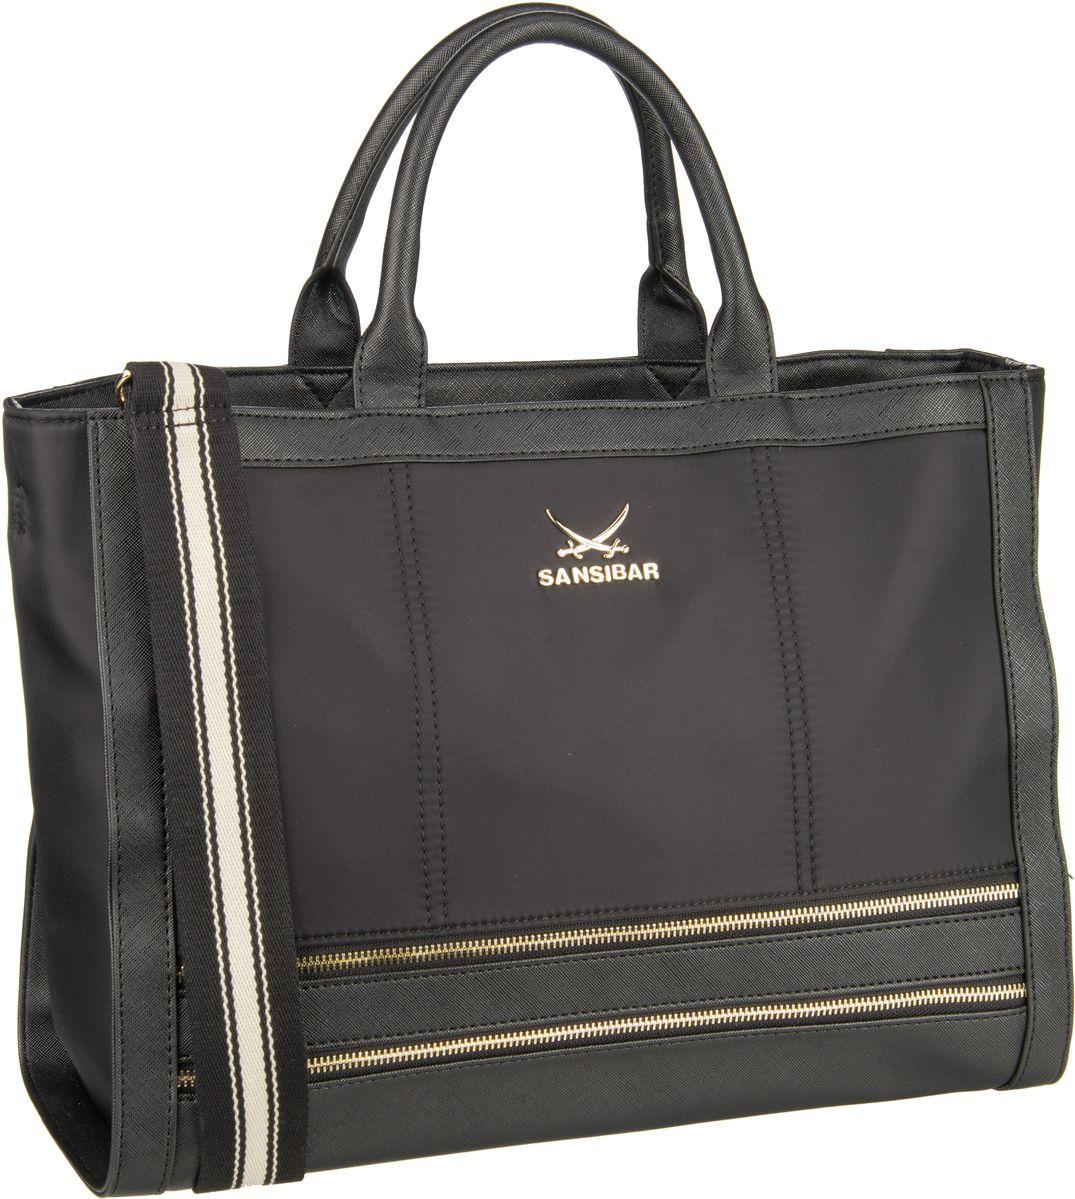 Handtasche Shopper Bag 1279 Black